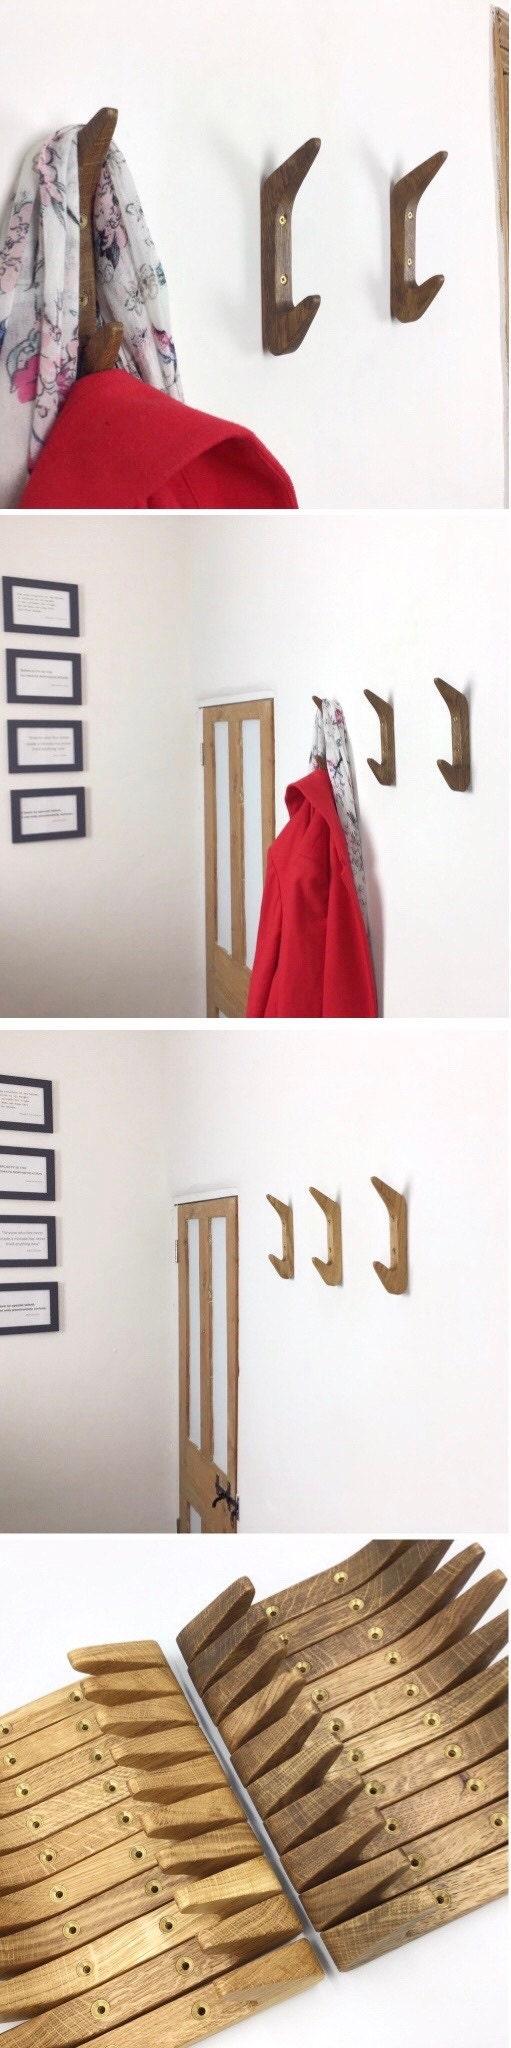 Gorlech double coat hooks in light and dark Oak wood, handcrafted in Wales, UK